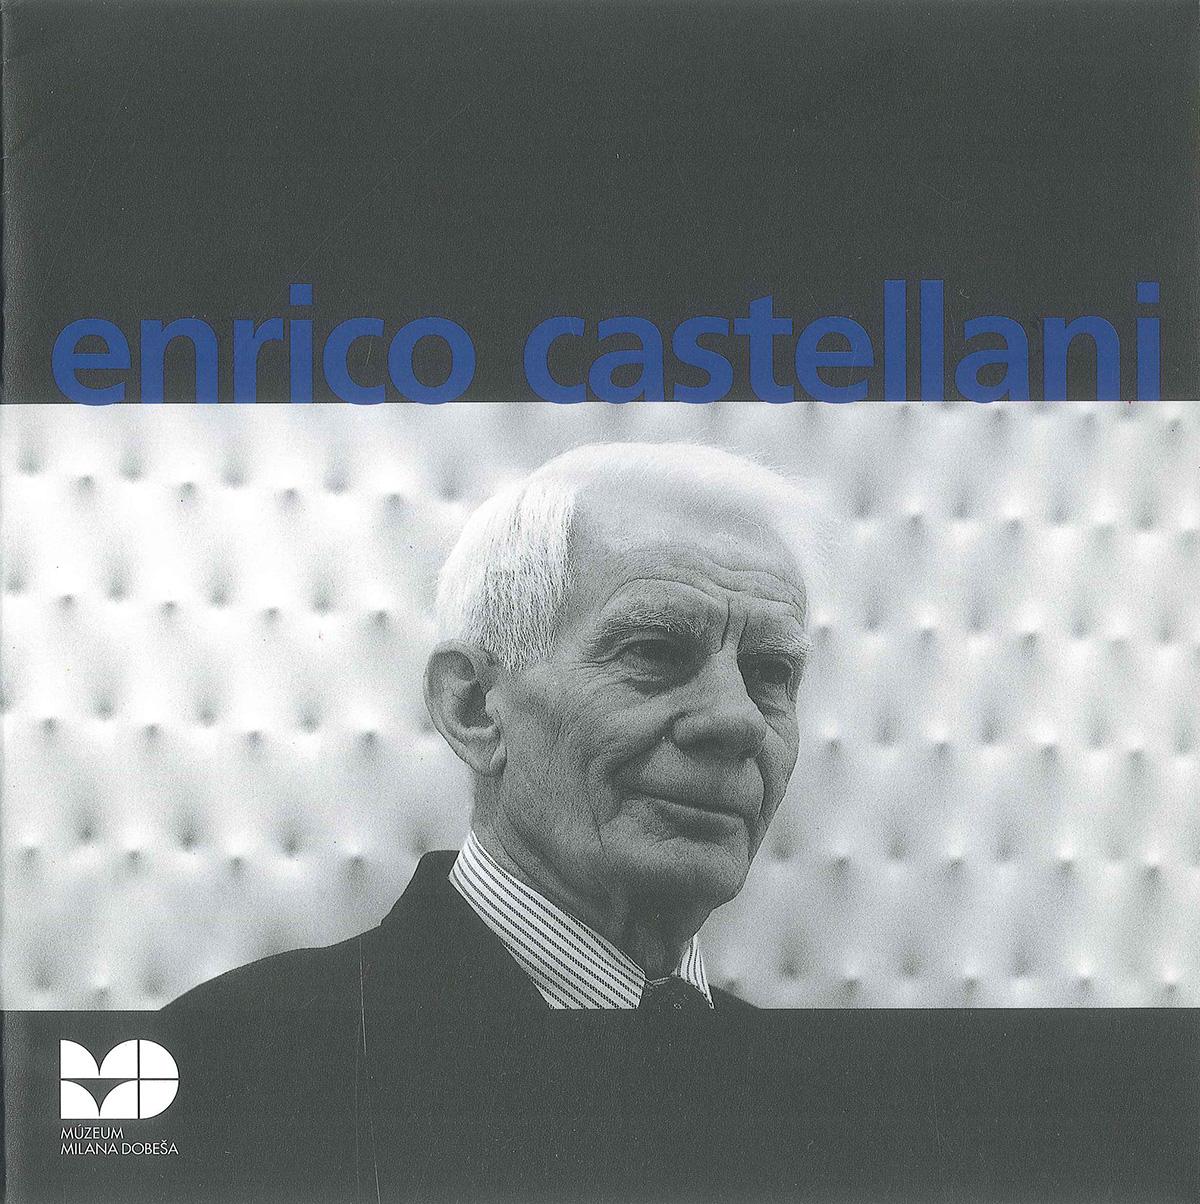 Copertina - Enrico Castellani, Rachele Ferrario, 2006, Mùzeum Milana Dobeša, Bratislava (SVK)